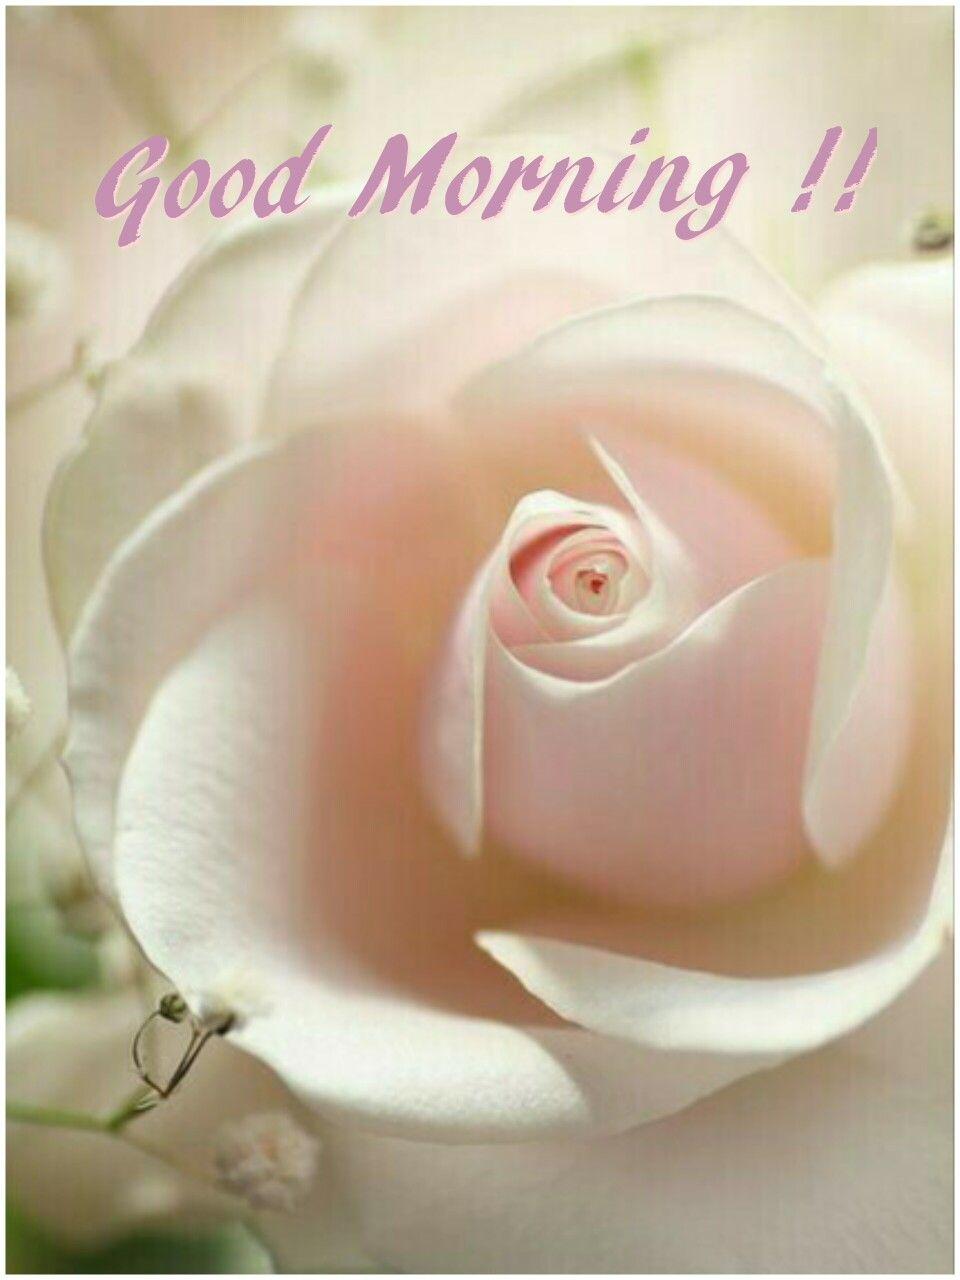 Good Morning Good Morning Pinterest Colorful Roses Flowers